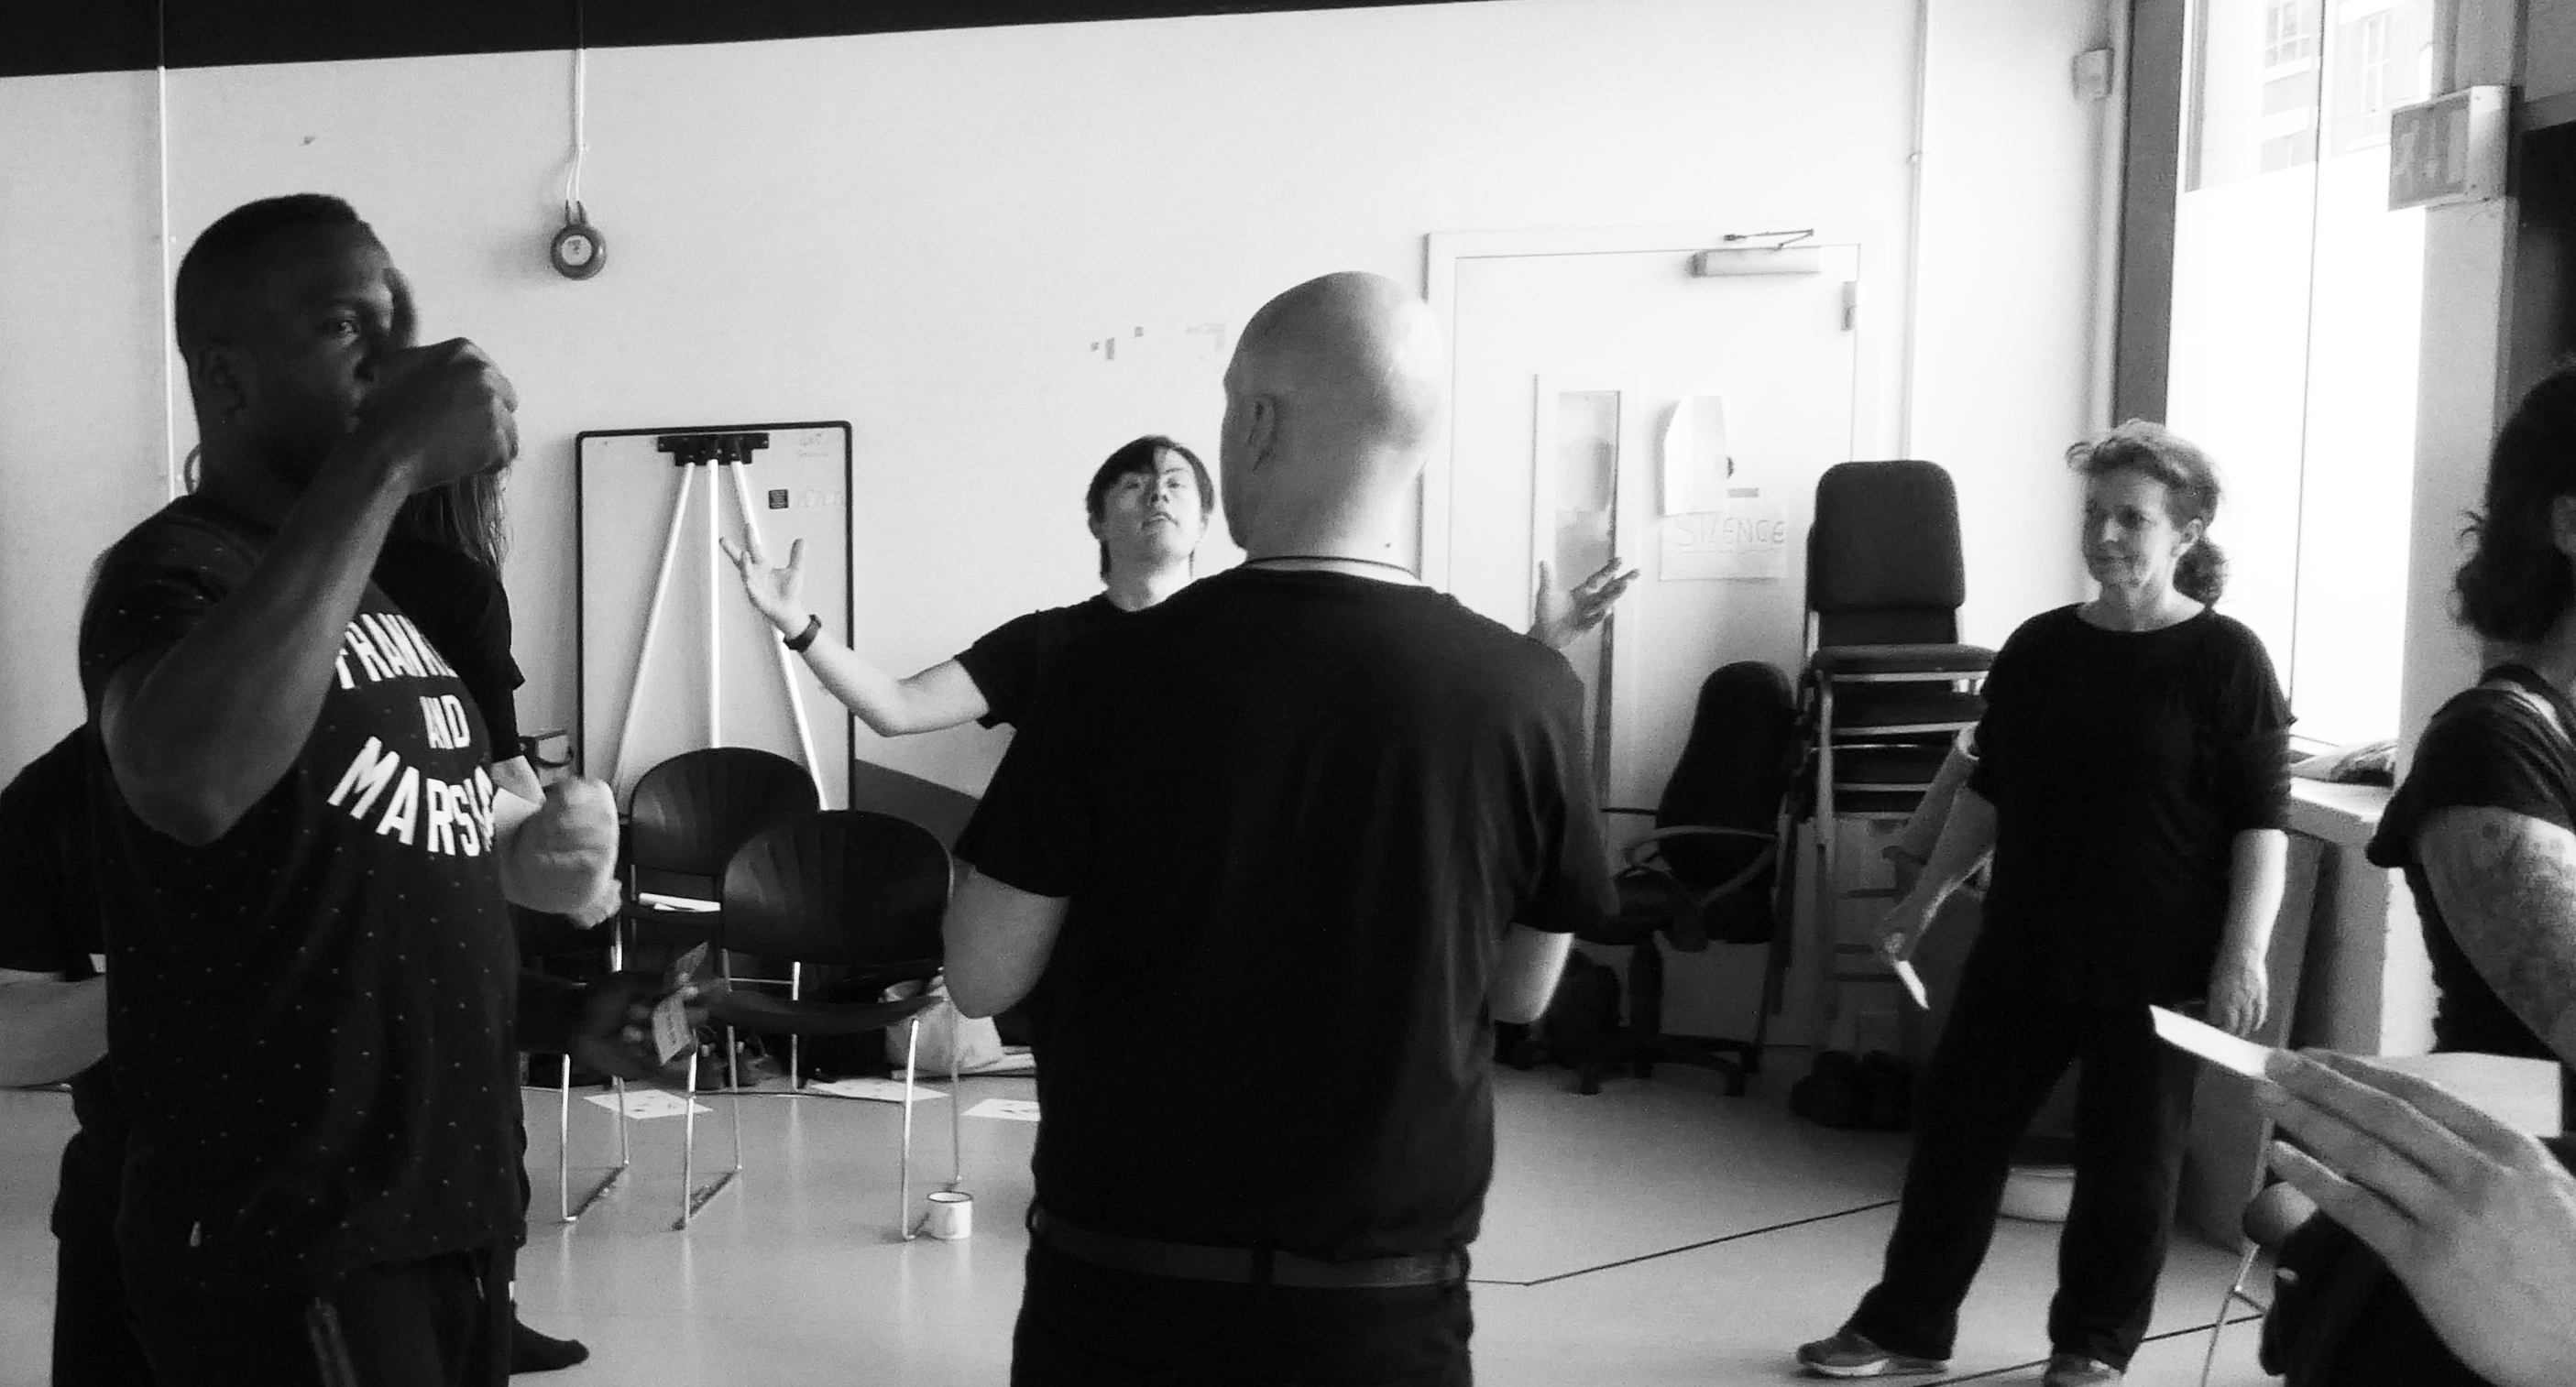 silent approach rehearsal at RADA